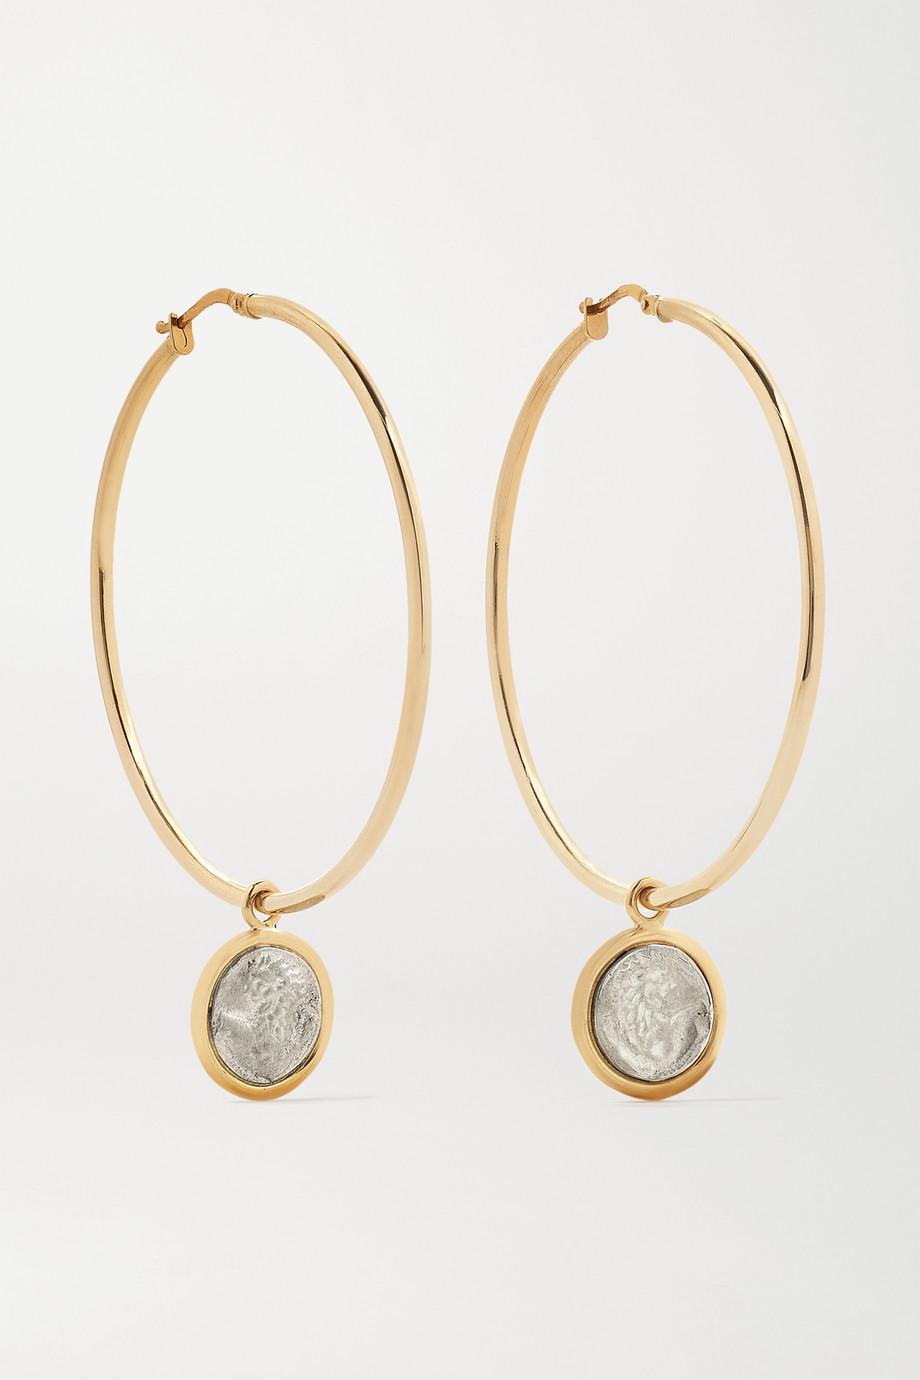 Dubini Lion 18-karat gold and sterling silver hoop earrings